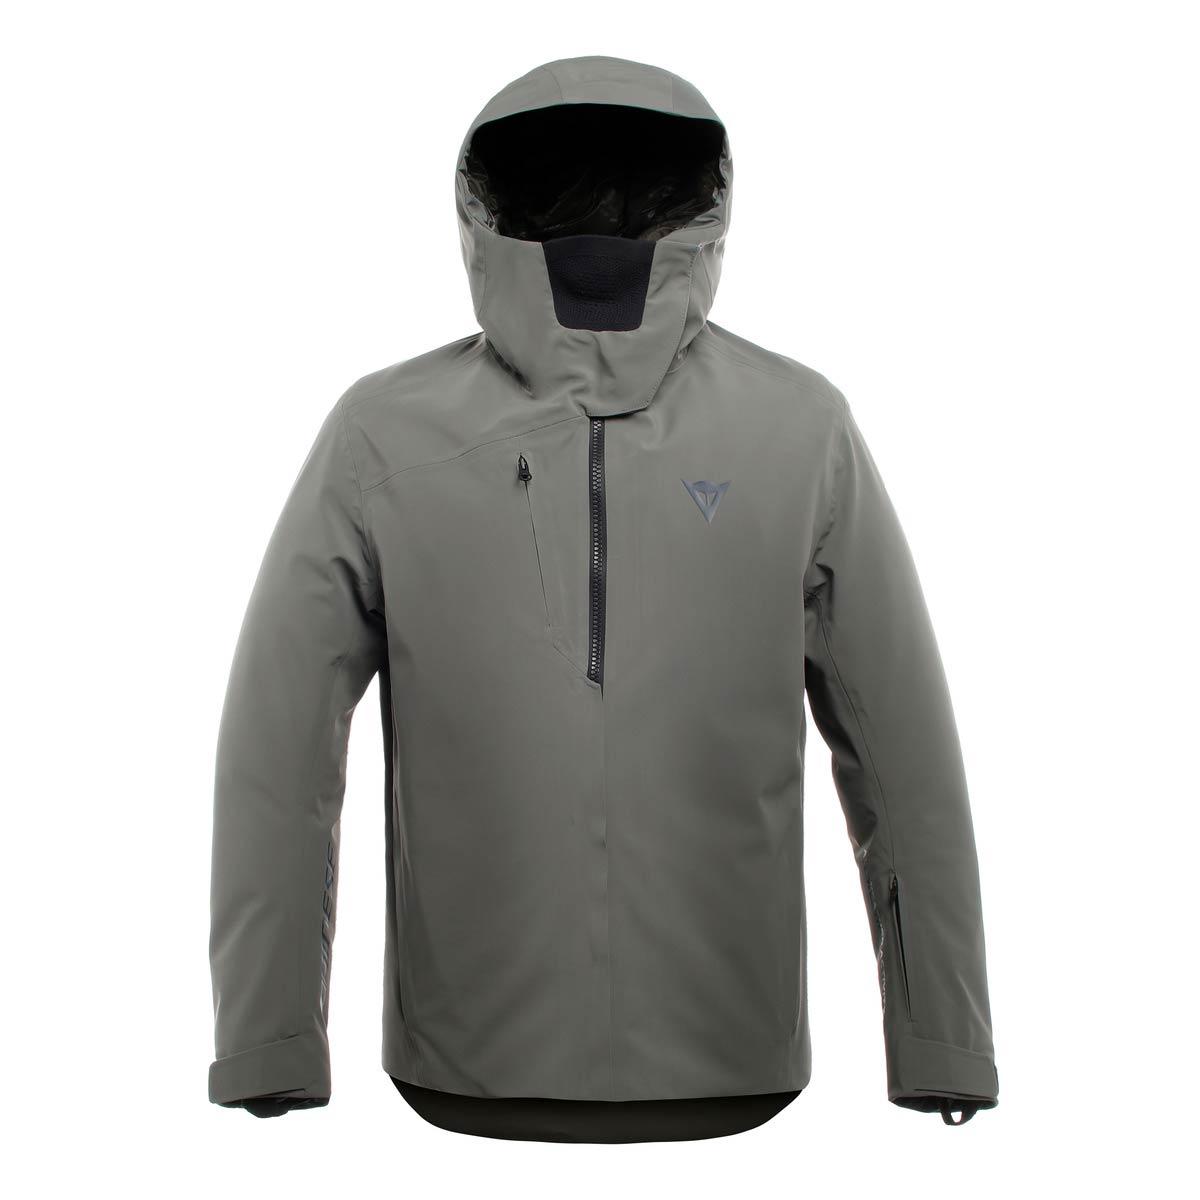 Dainese Outerwear Jacke: AWA M3